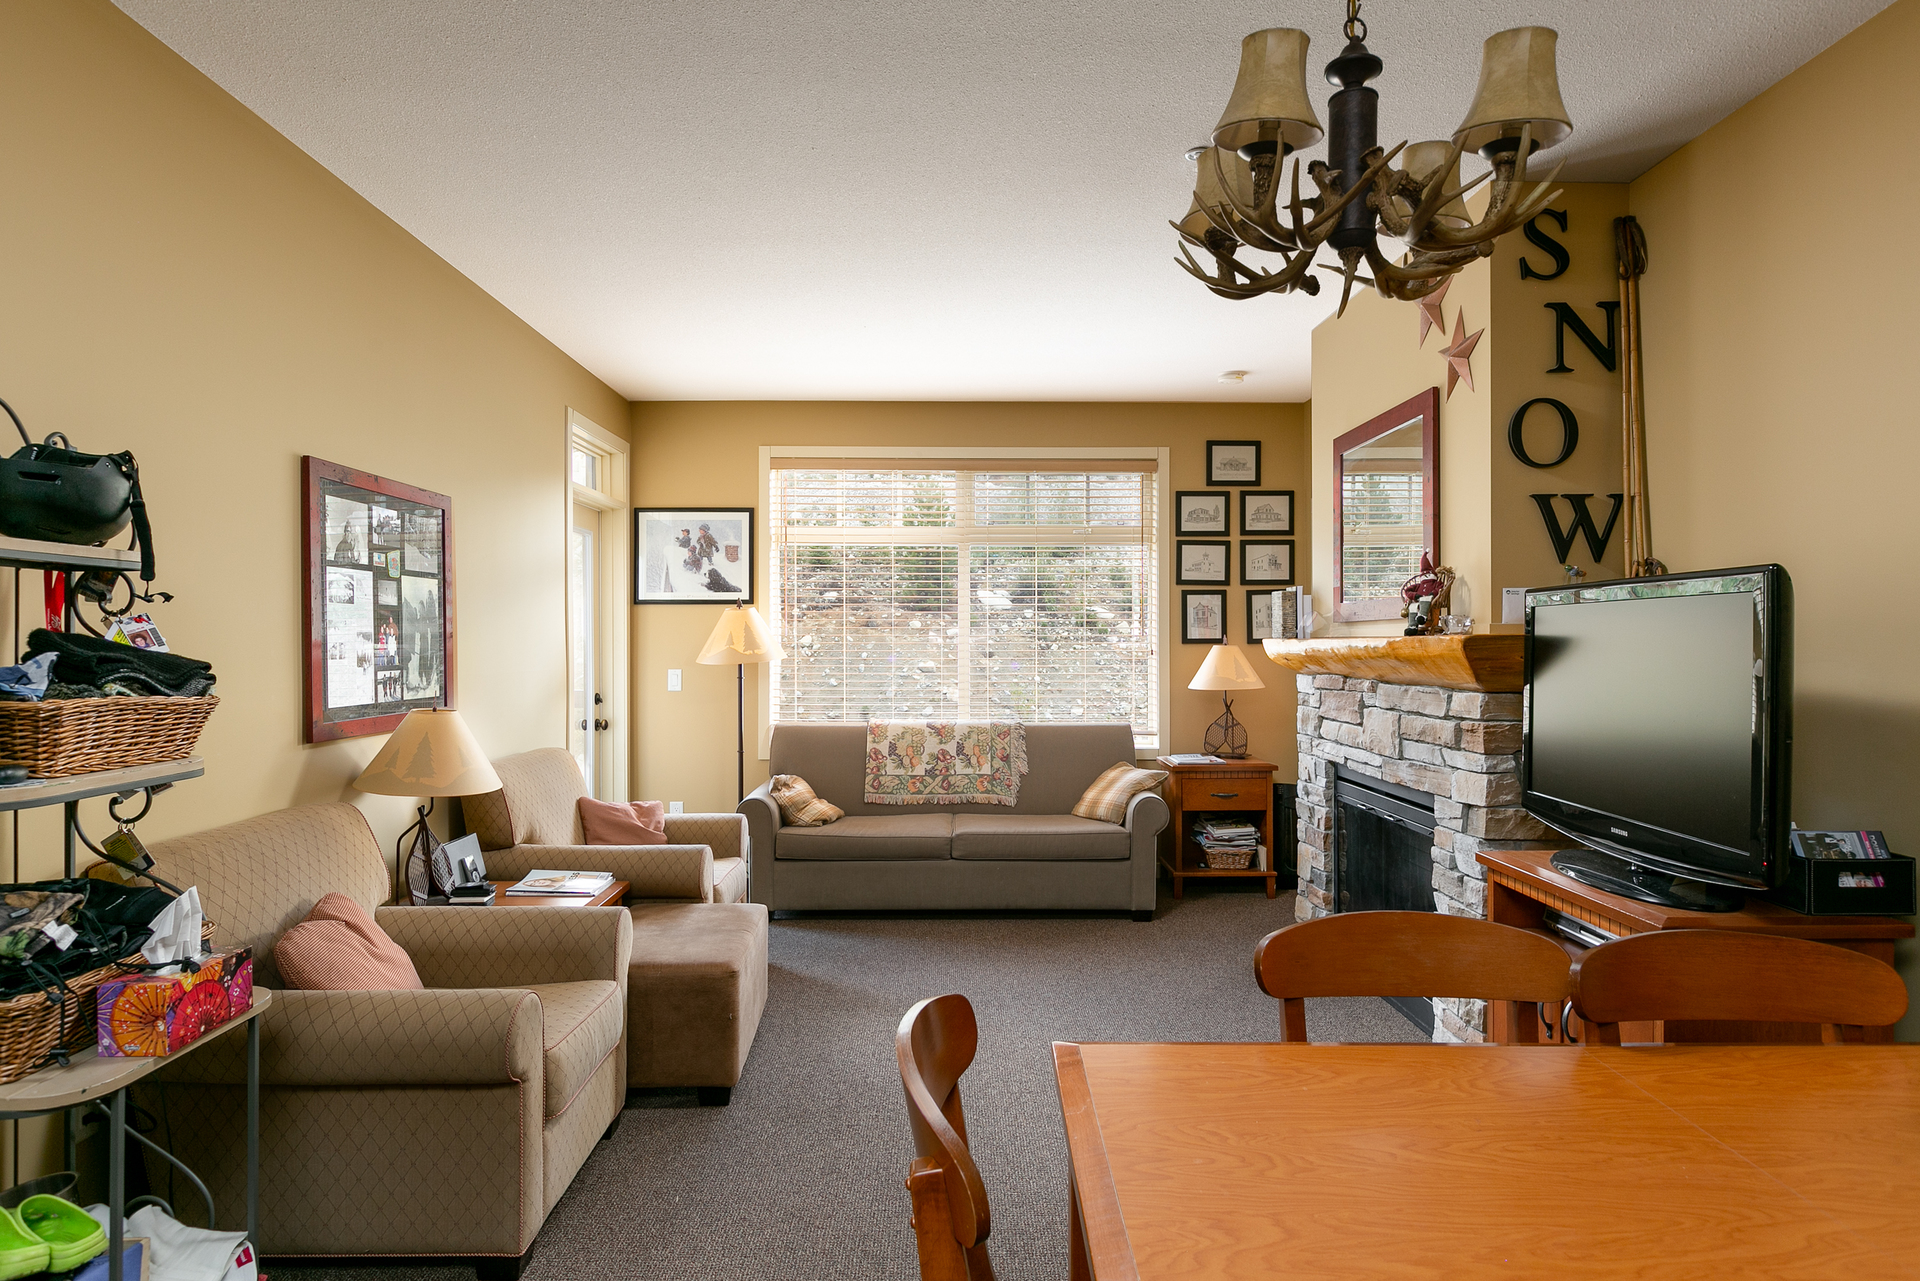 5d3_4057-edit at 301 - 255 Feathertop Way, Big White, Central Okanagan